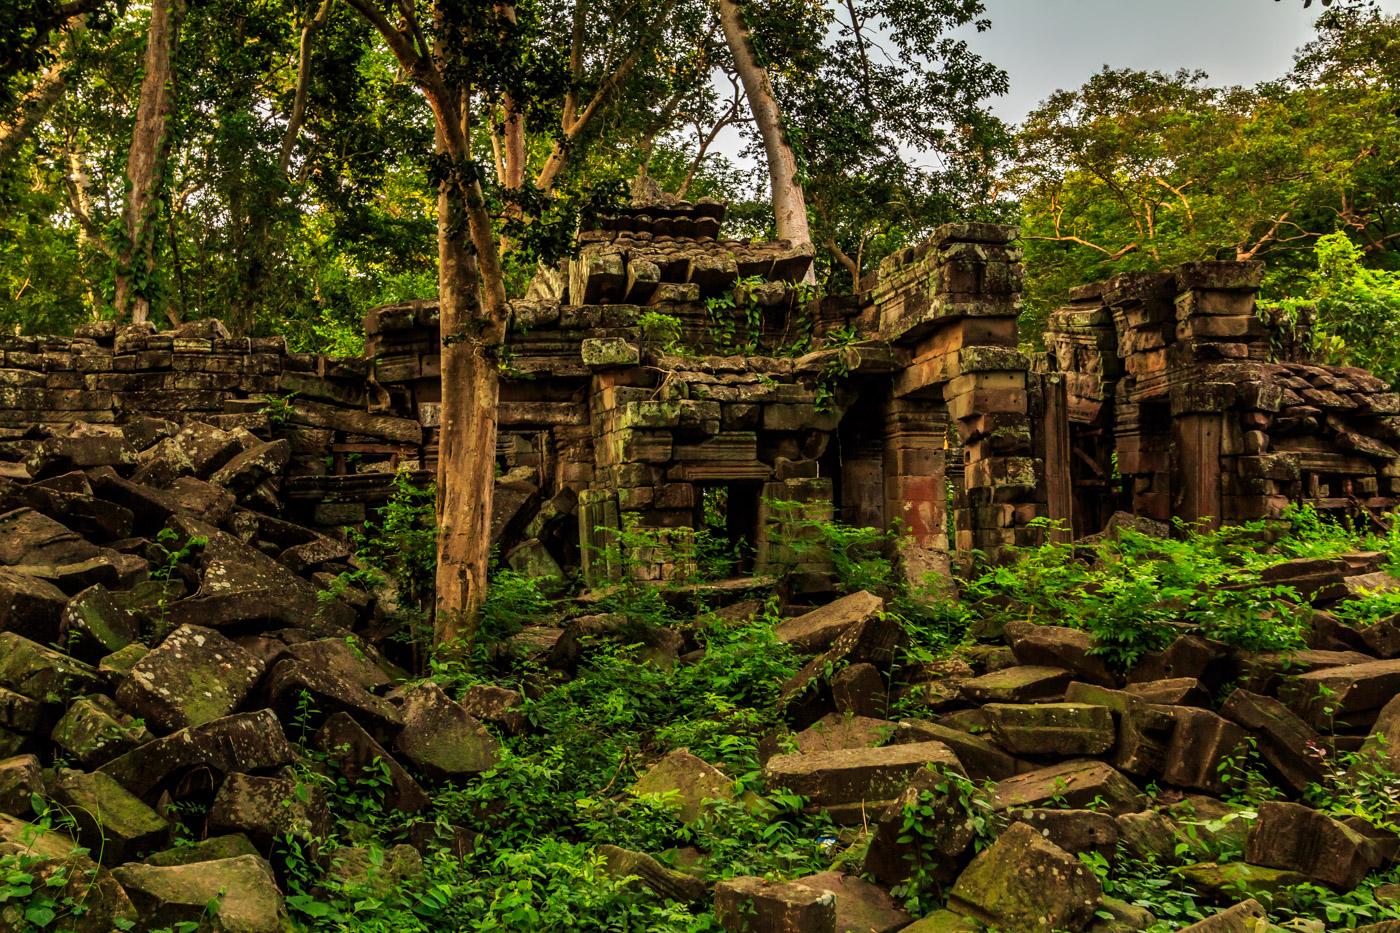 Overgrown ruins.